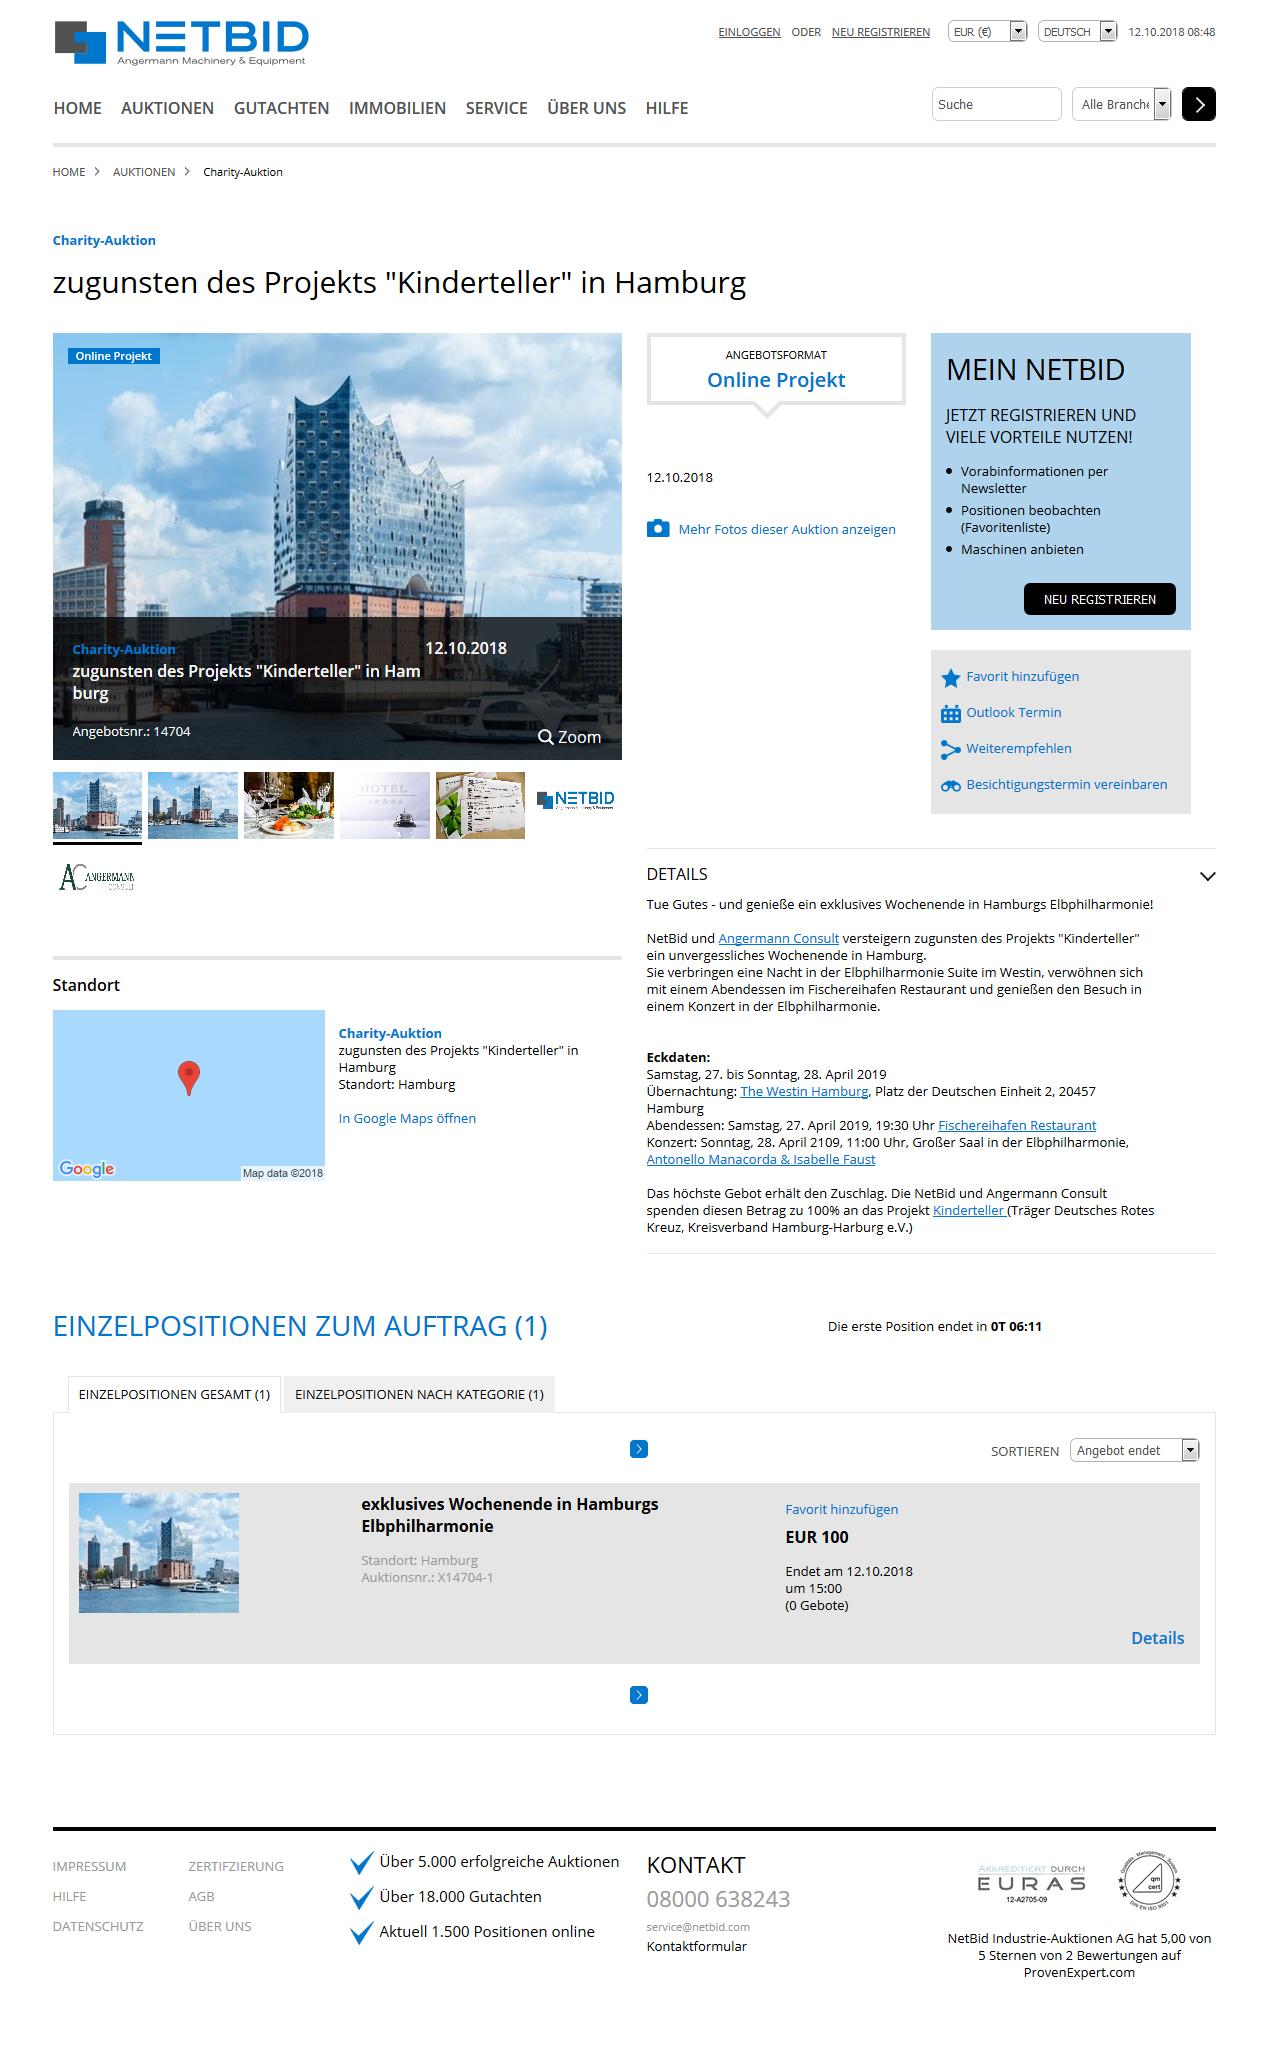 Angermann Blog Immobilien Investment Bürovermietung Valuation